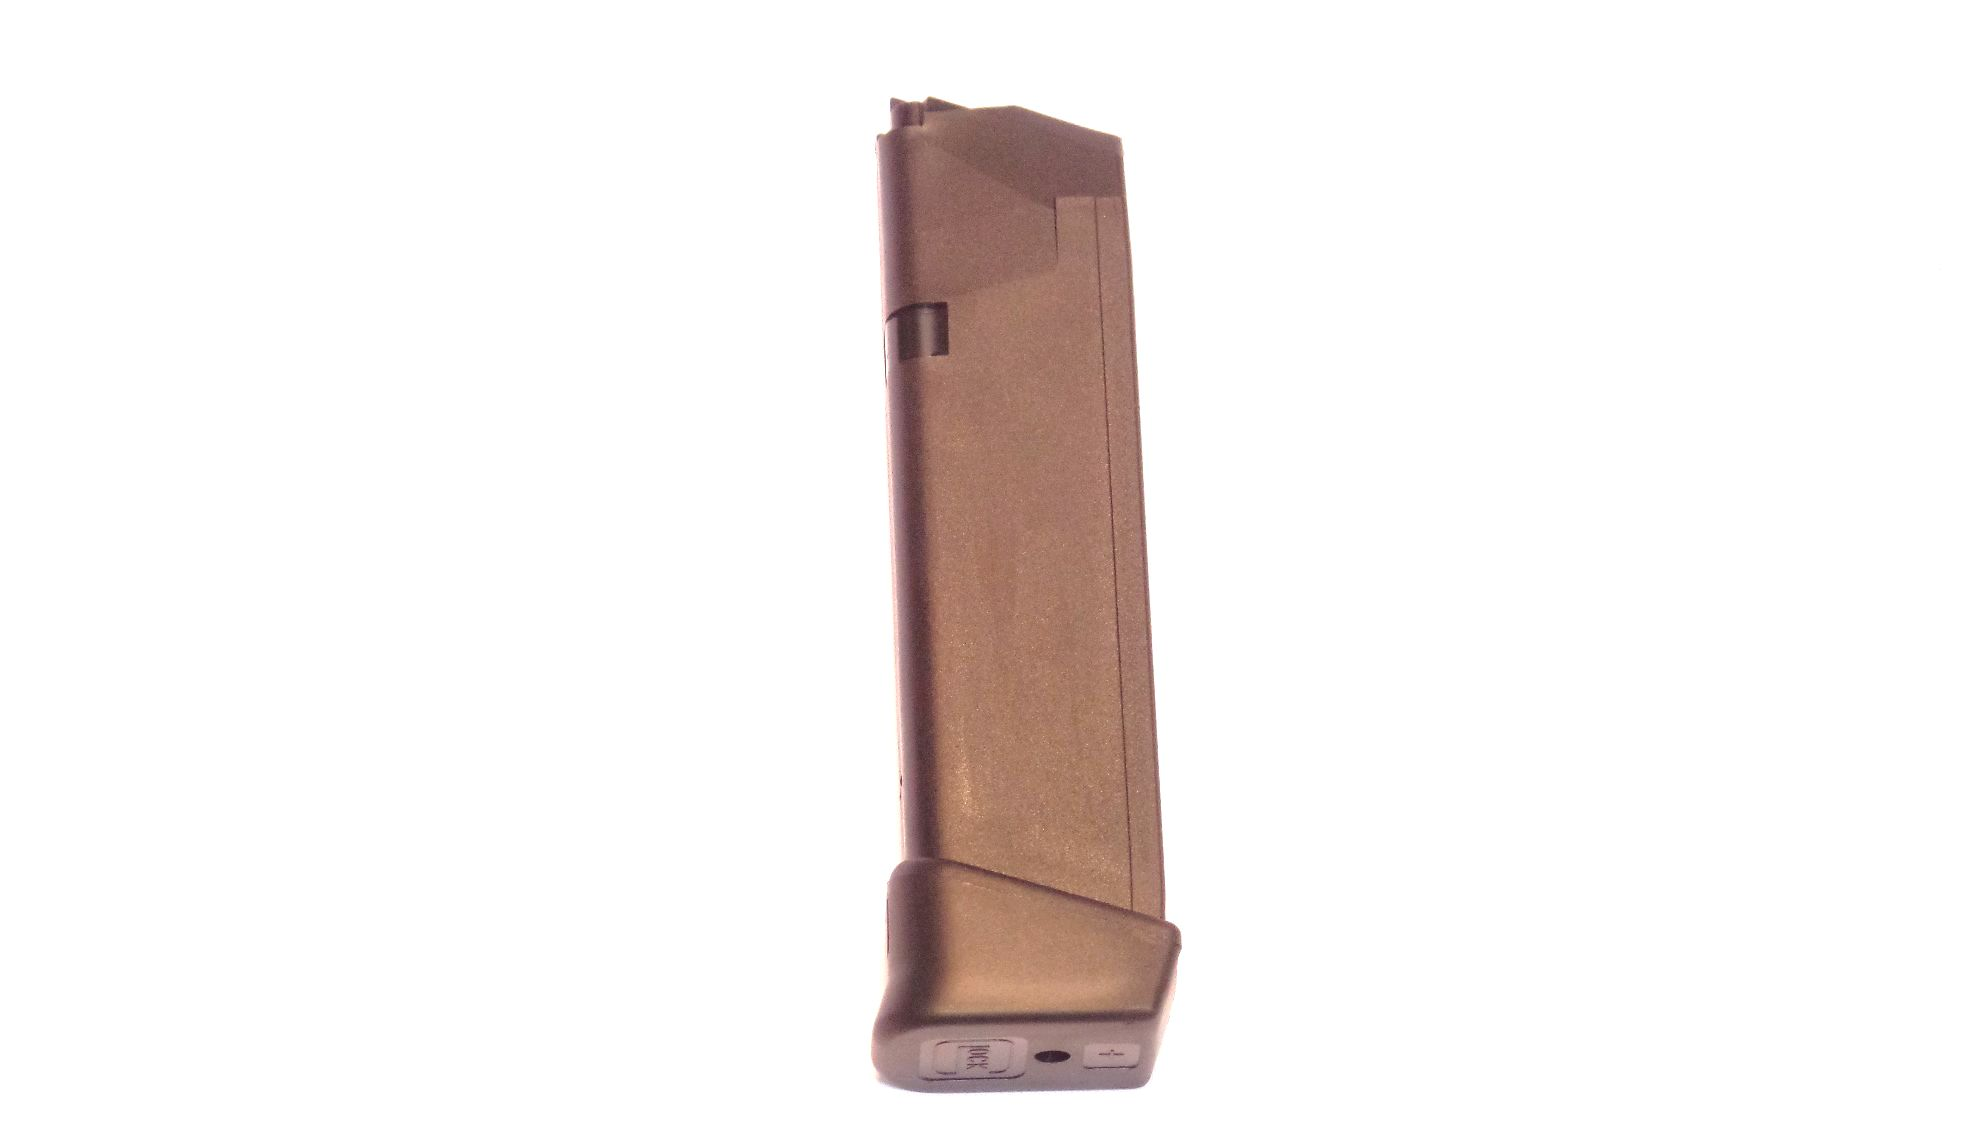 CHARGEUR GLOCK 17+2 calibre 9Para